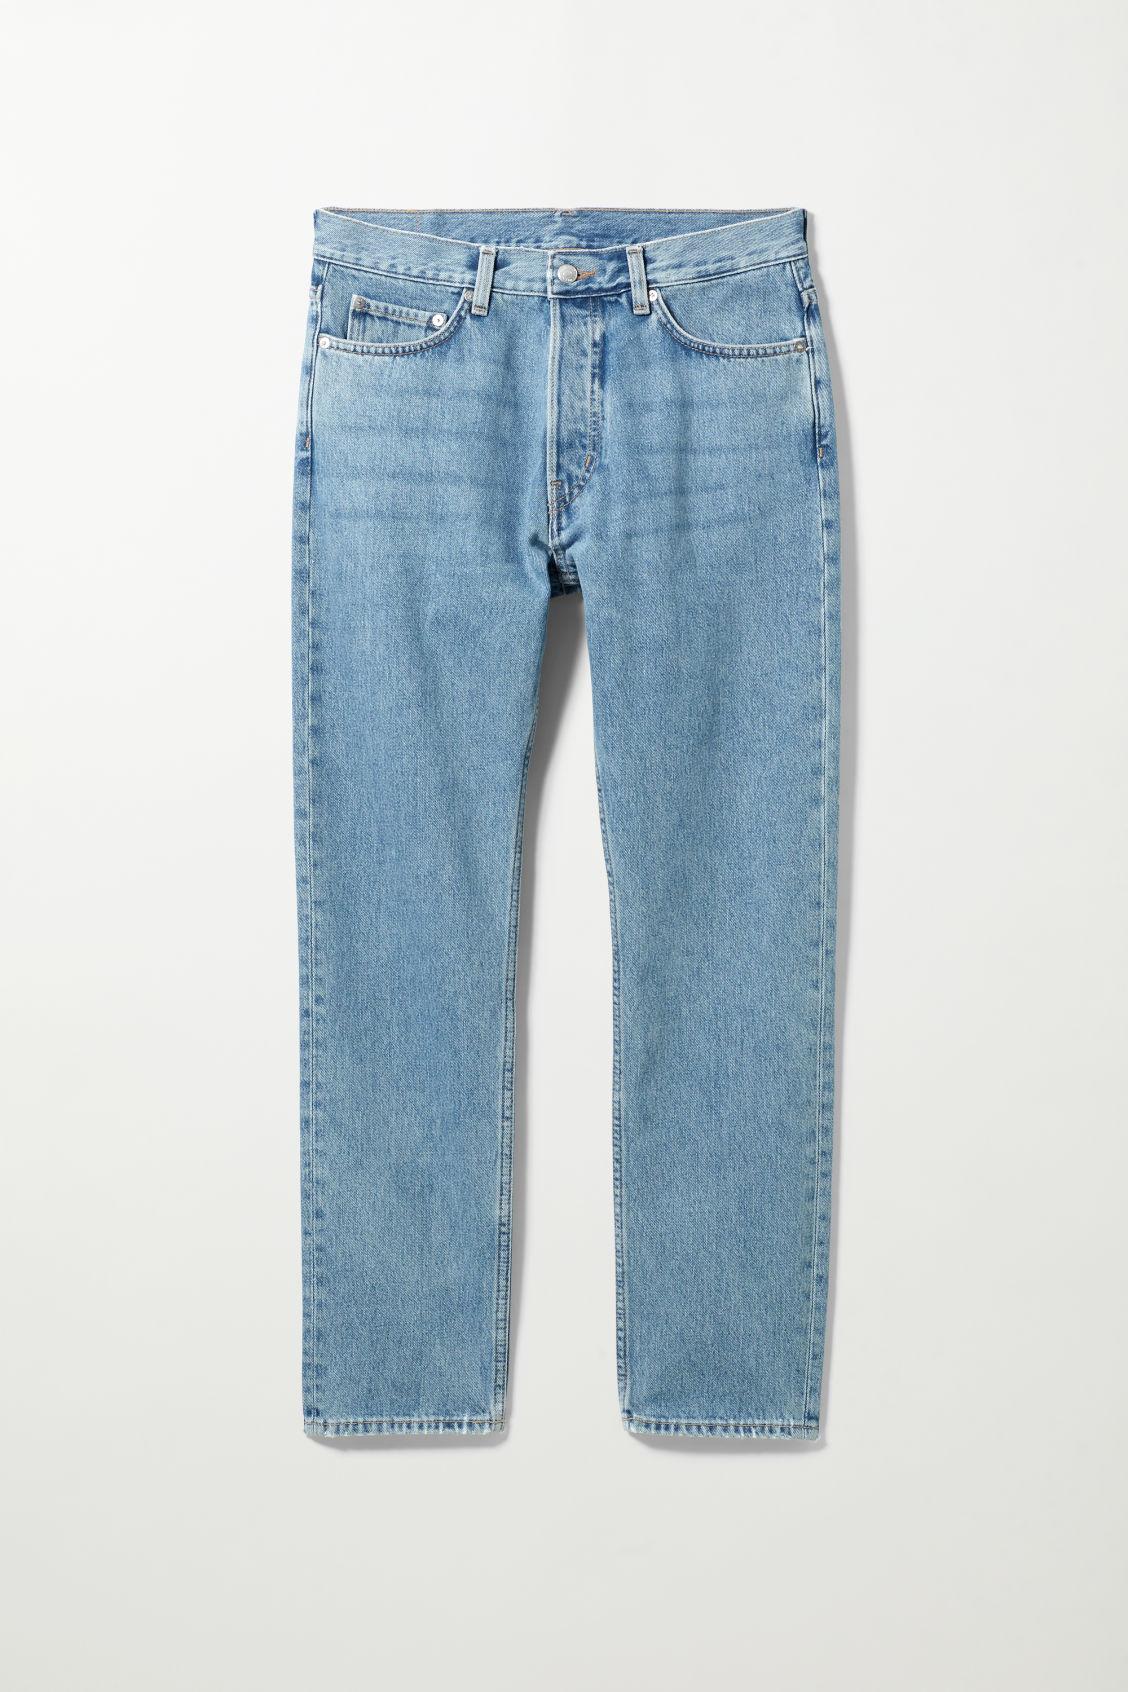 Pine Regular Tapered Jeans - Blue